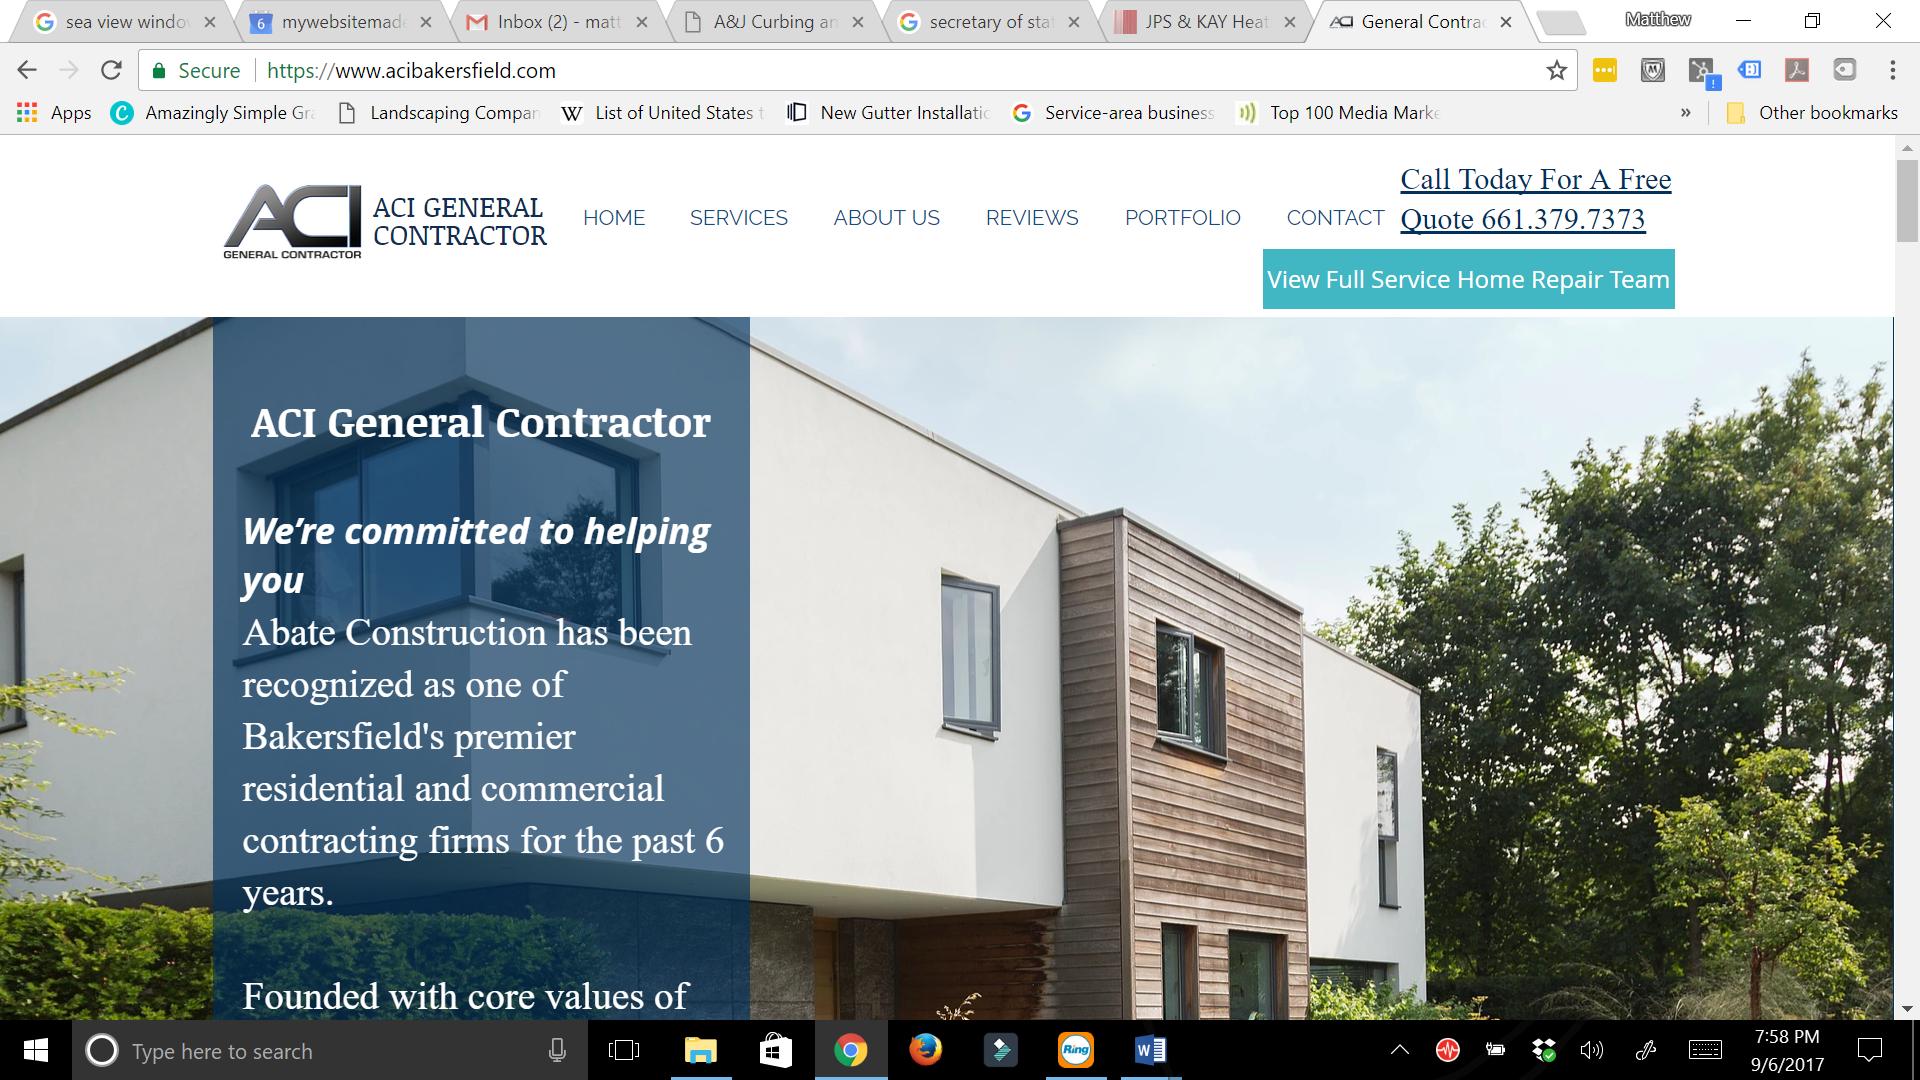 ACI General contractor